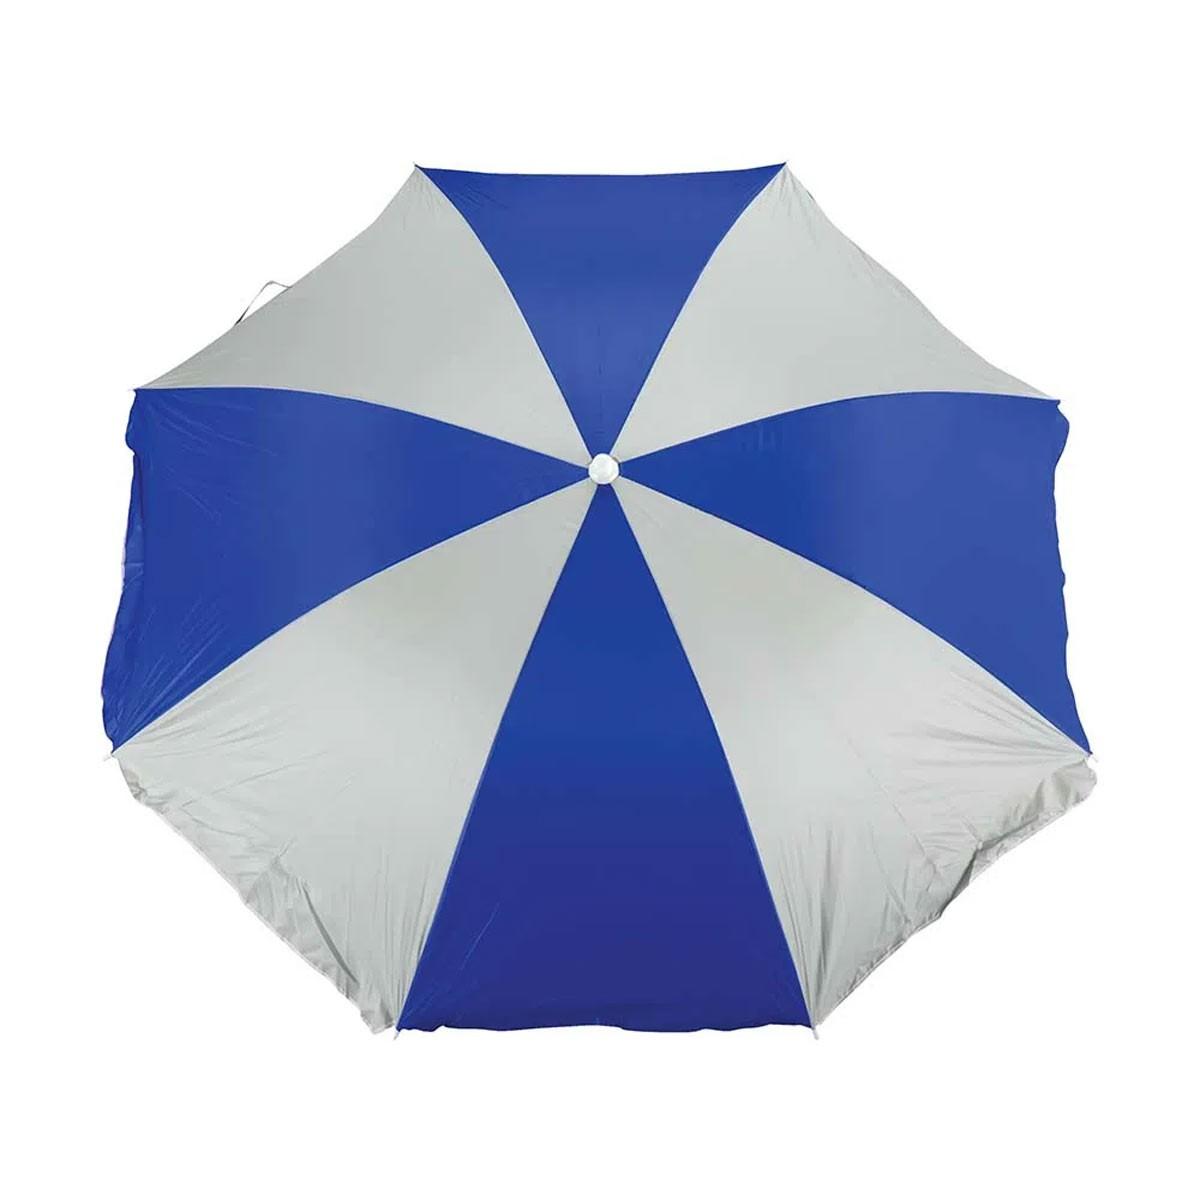 Guarda Sol Mor Scoat 1,80m - Cor Azul Marinho / Cinza